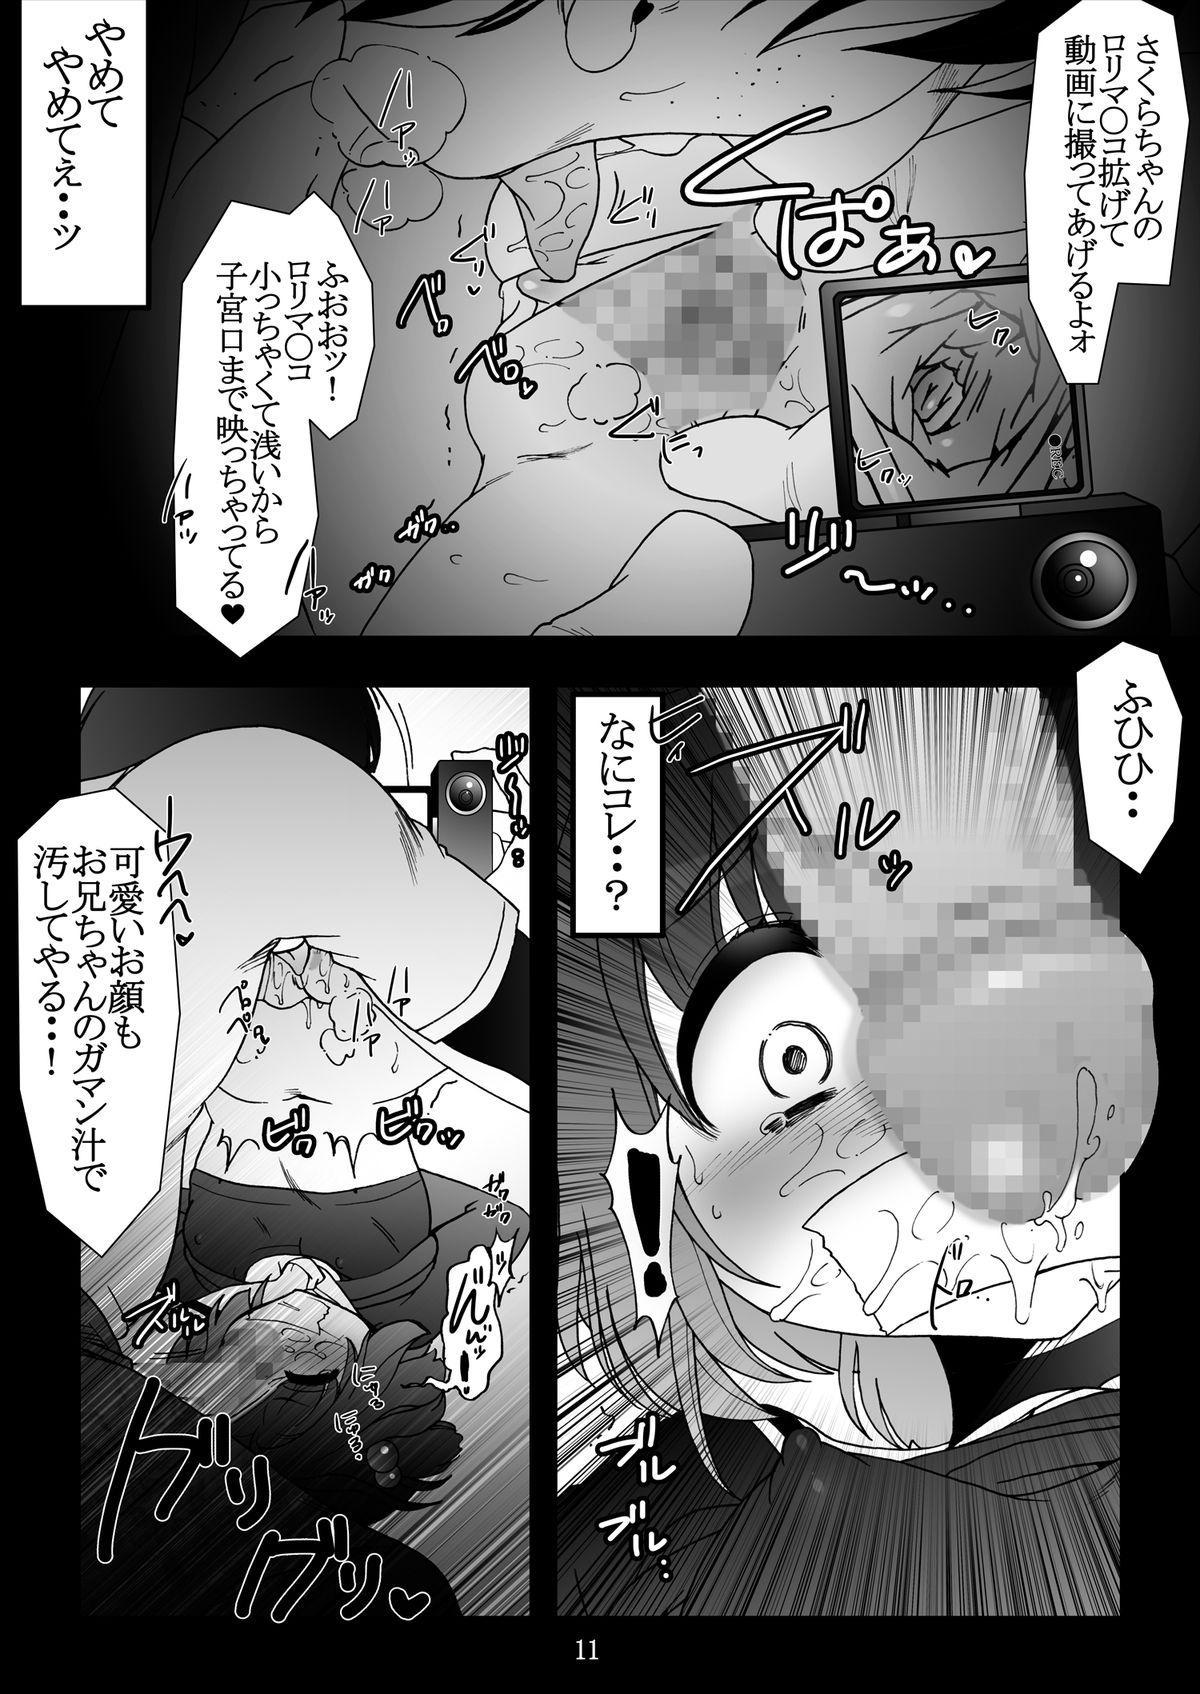 Sakura Slave to the Grind 10